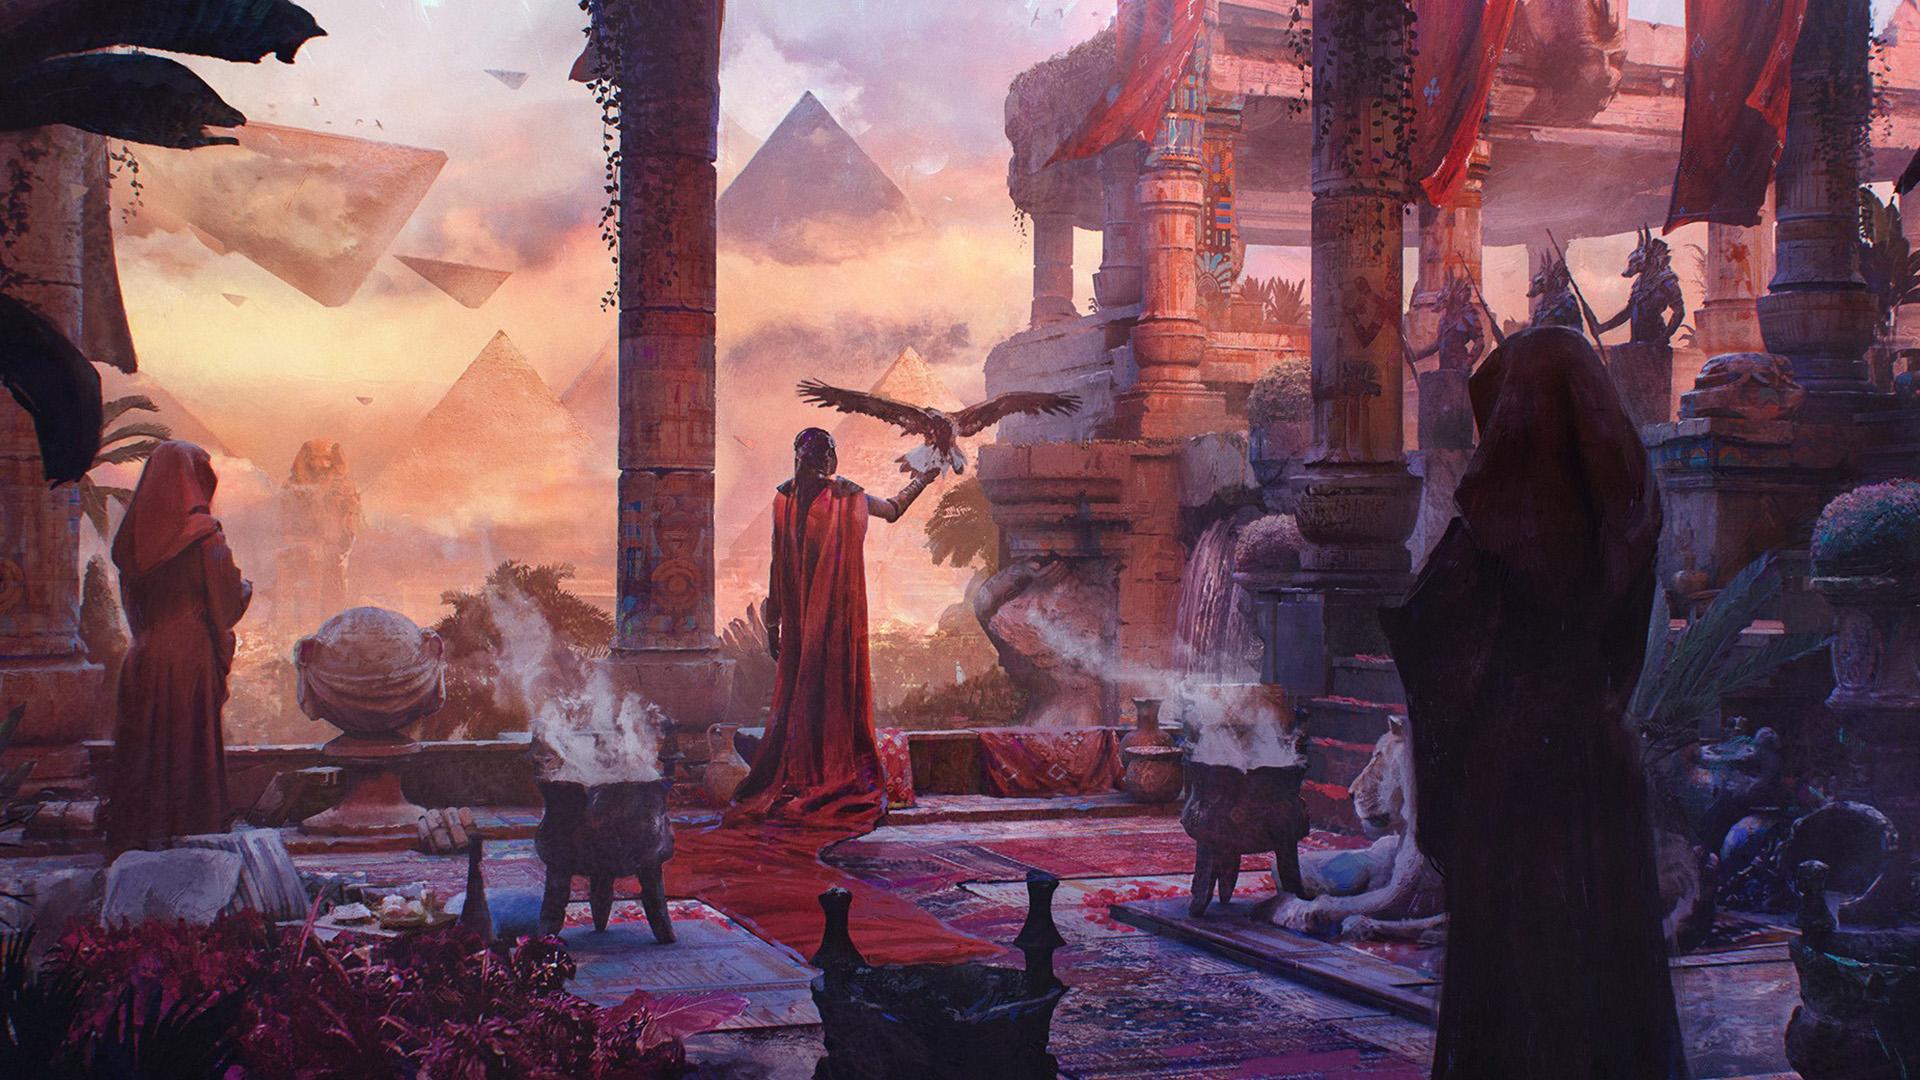 Masaustu Dijital Sanat Boyama Resim Eski Misir Piramit